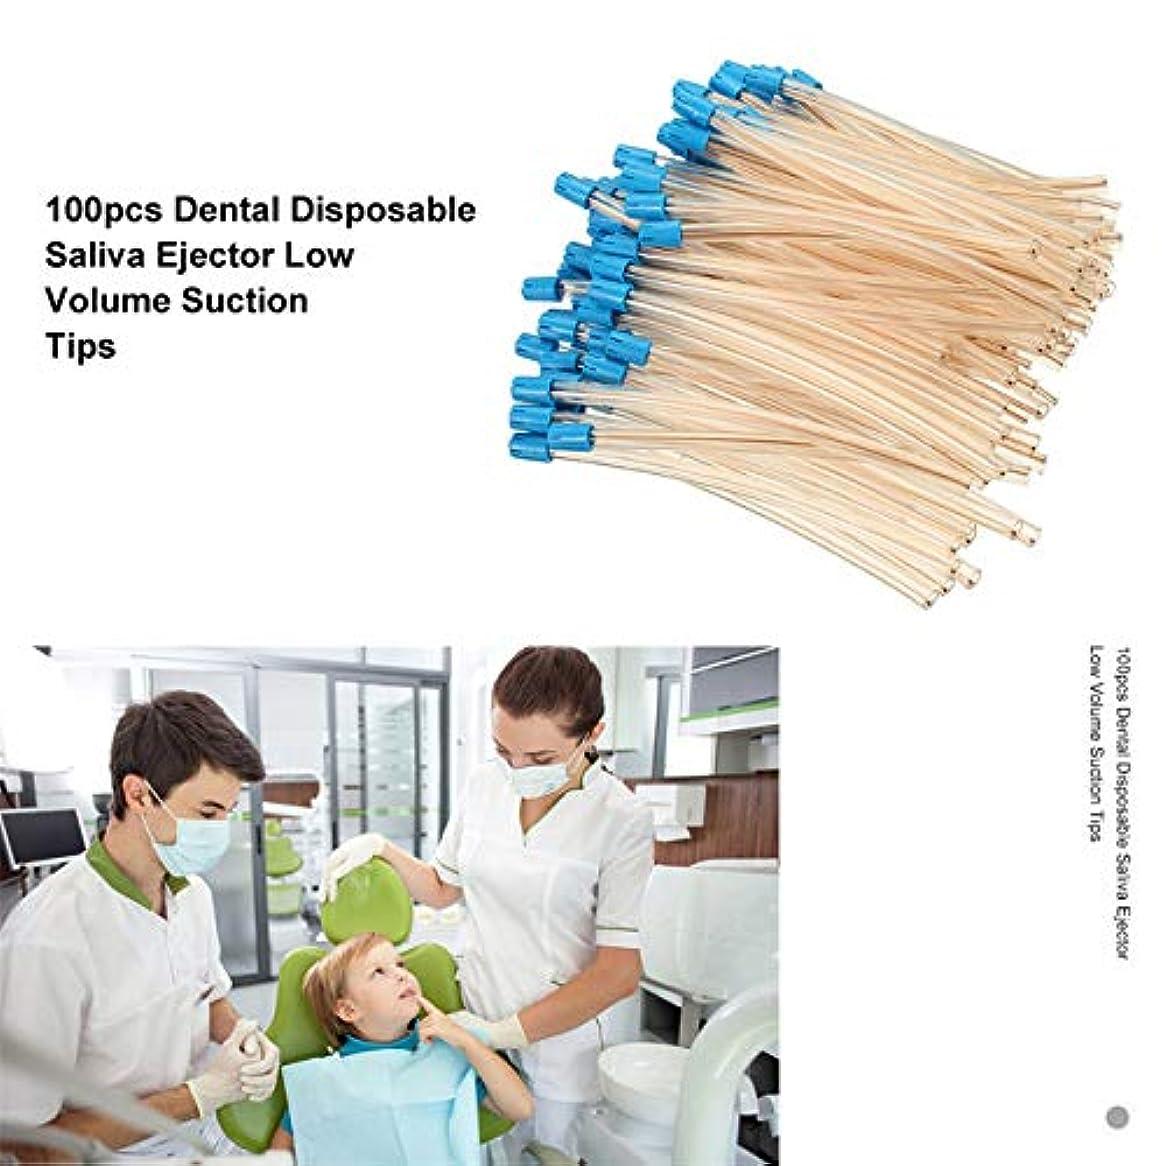 Rabugoo 100個の歯科用使い捨て唾液エジェクタ低容量吸引チップアスピレータチューブオーラルケアツール